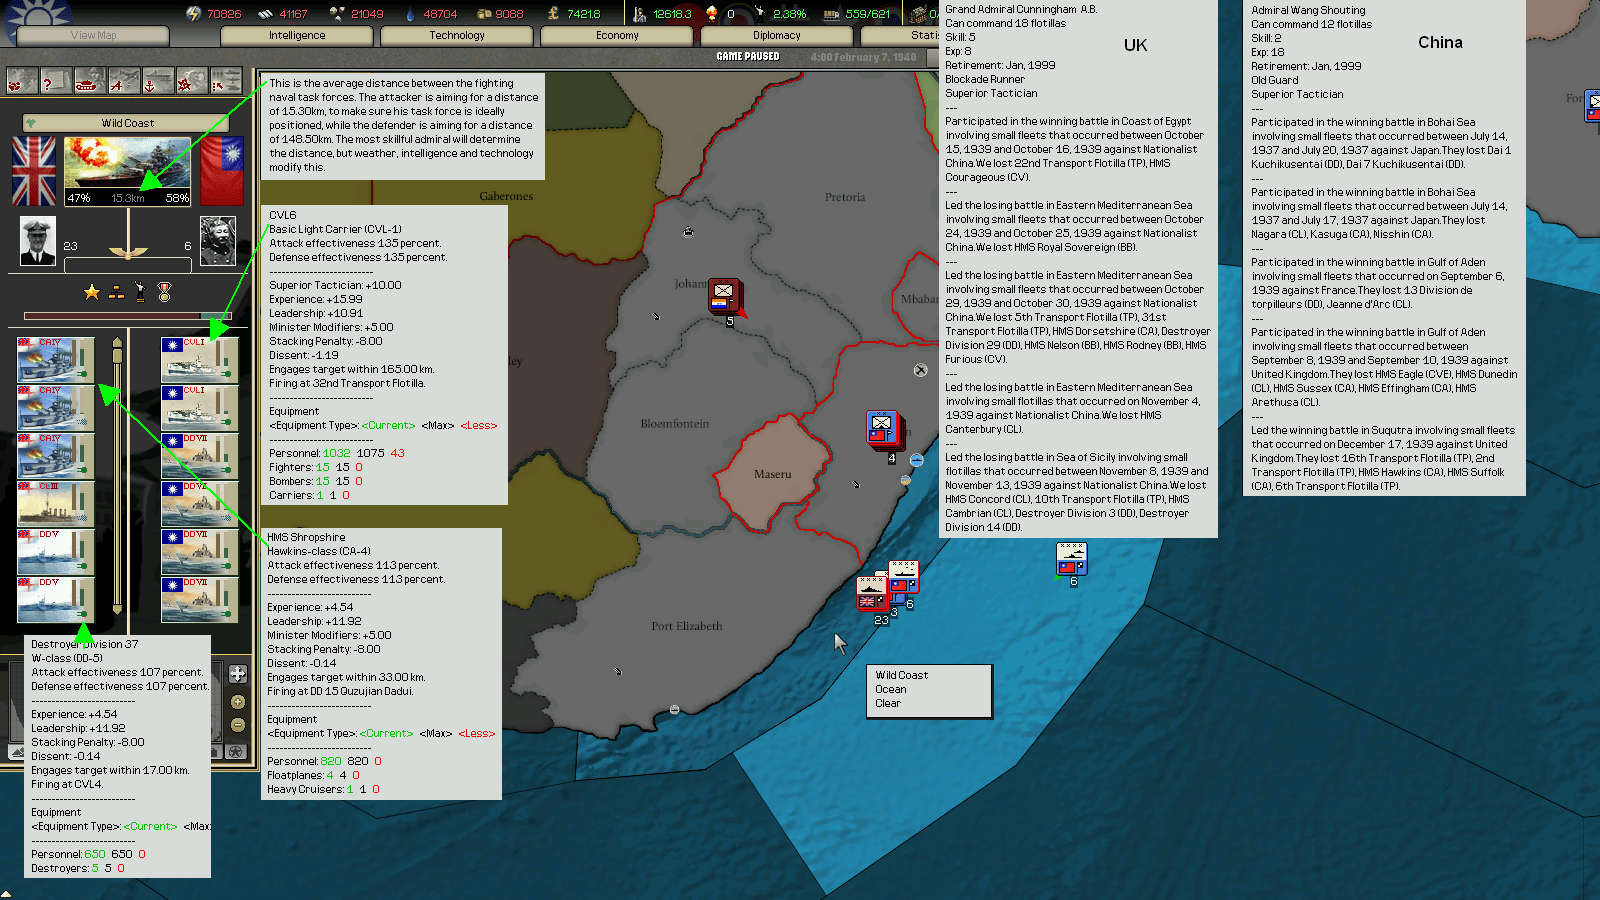 CVL-defending.png